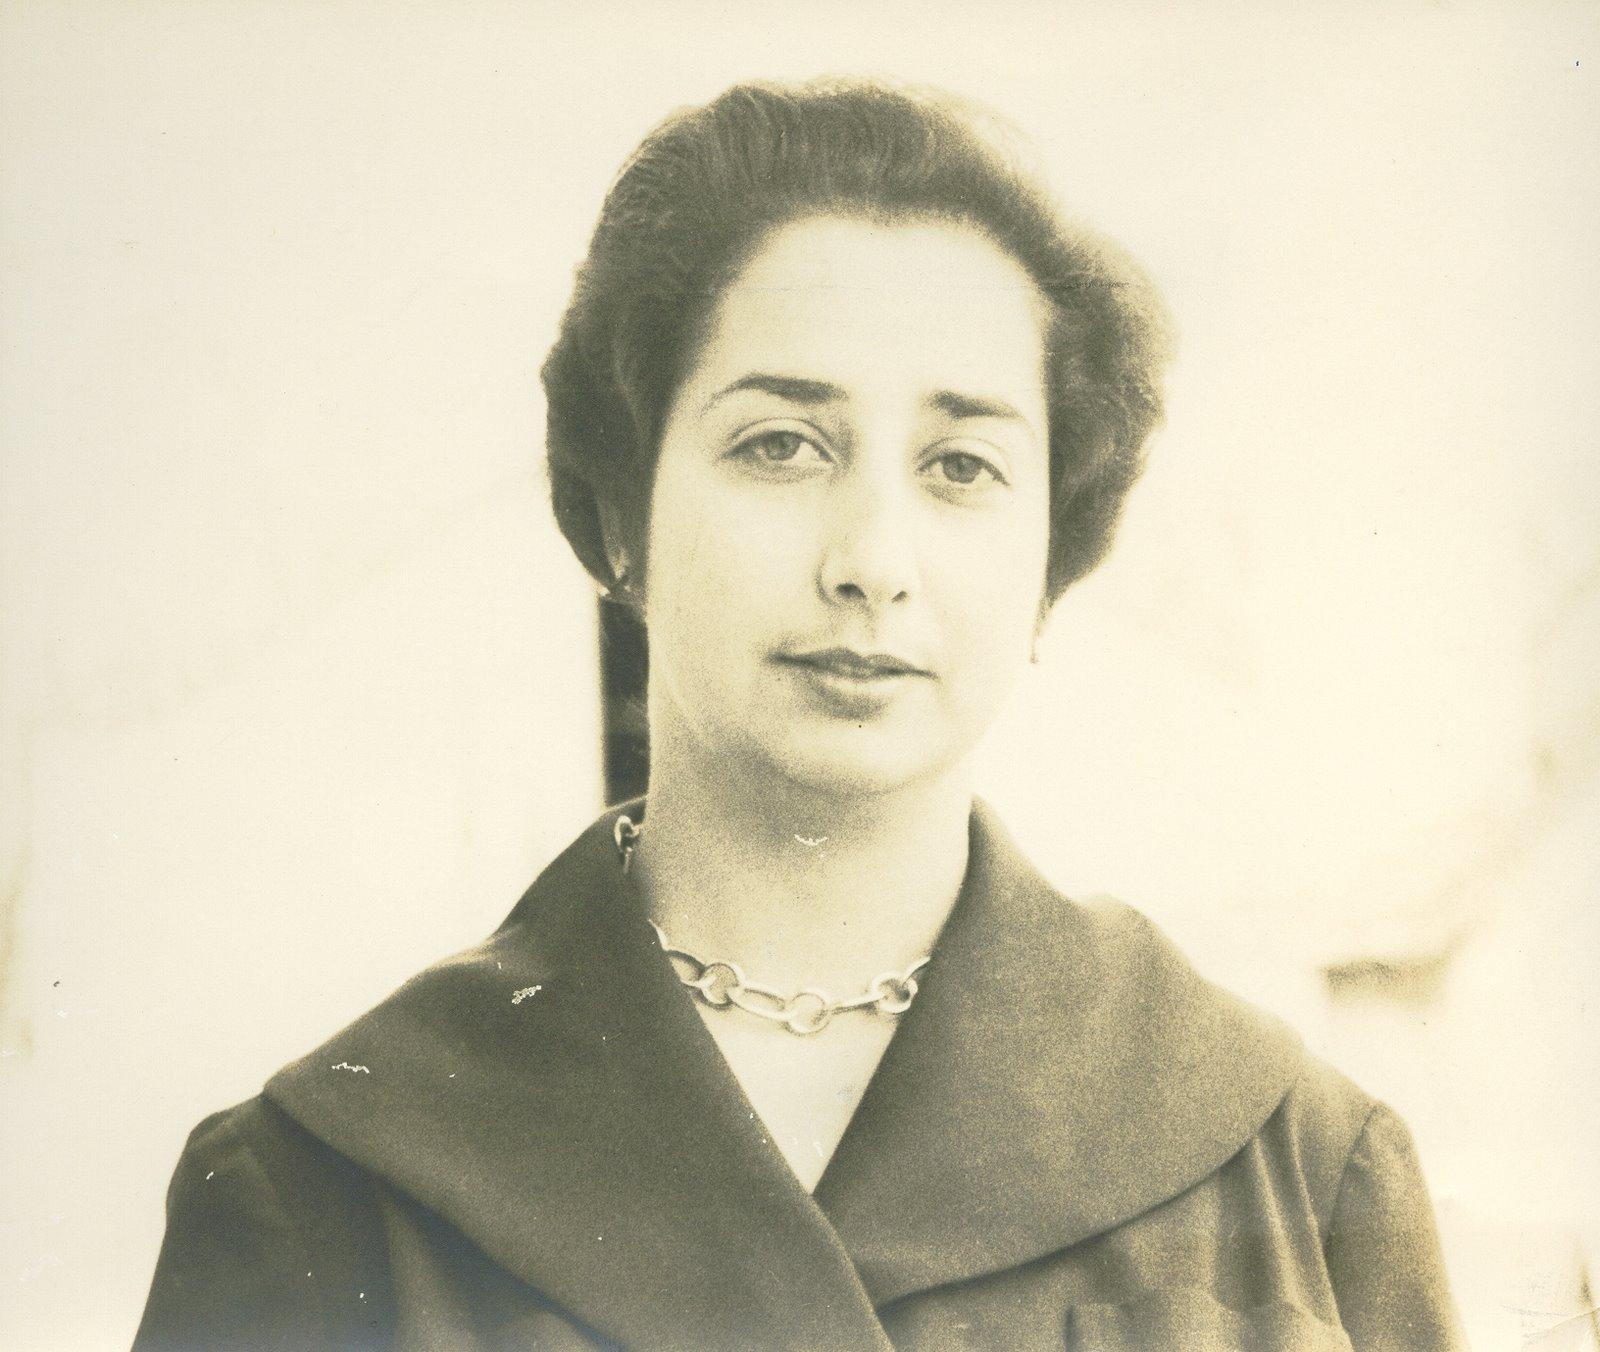 Maria Laura Cabrita Seixas